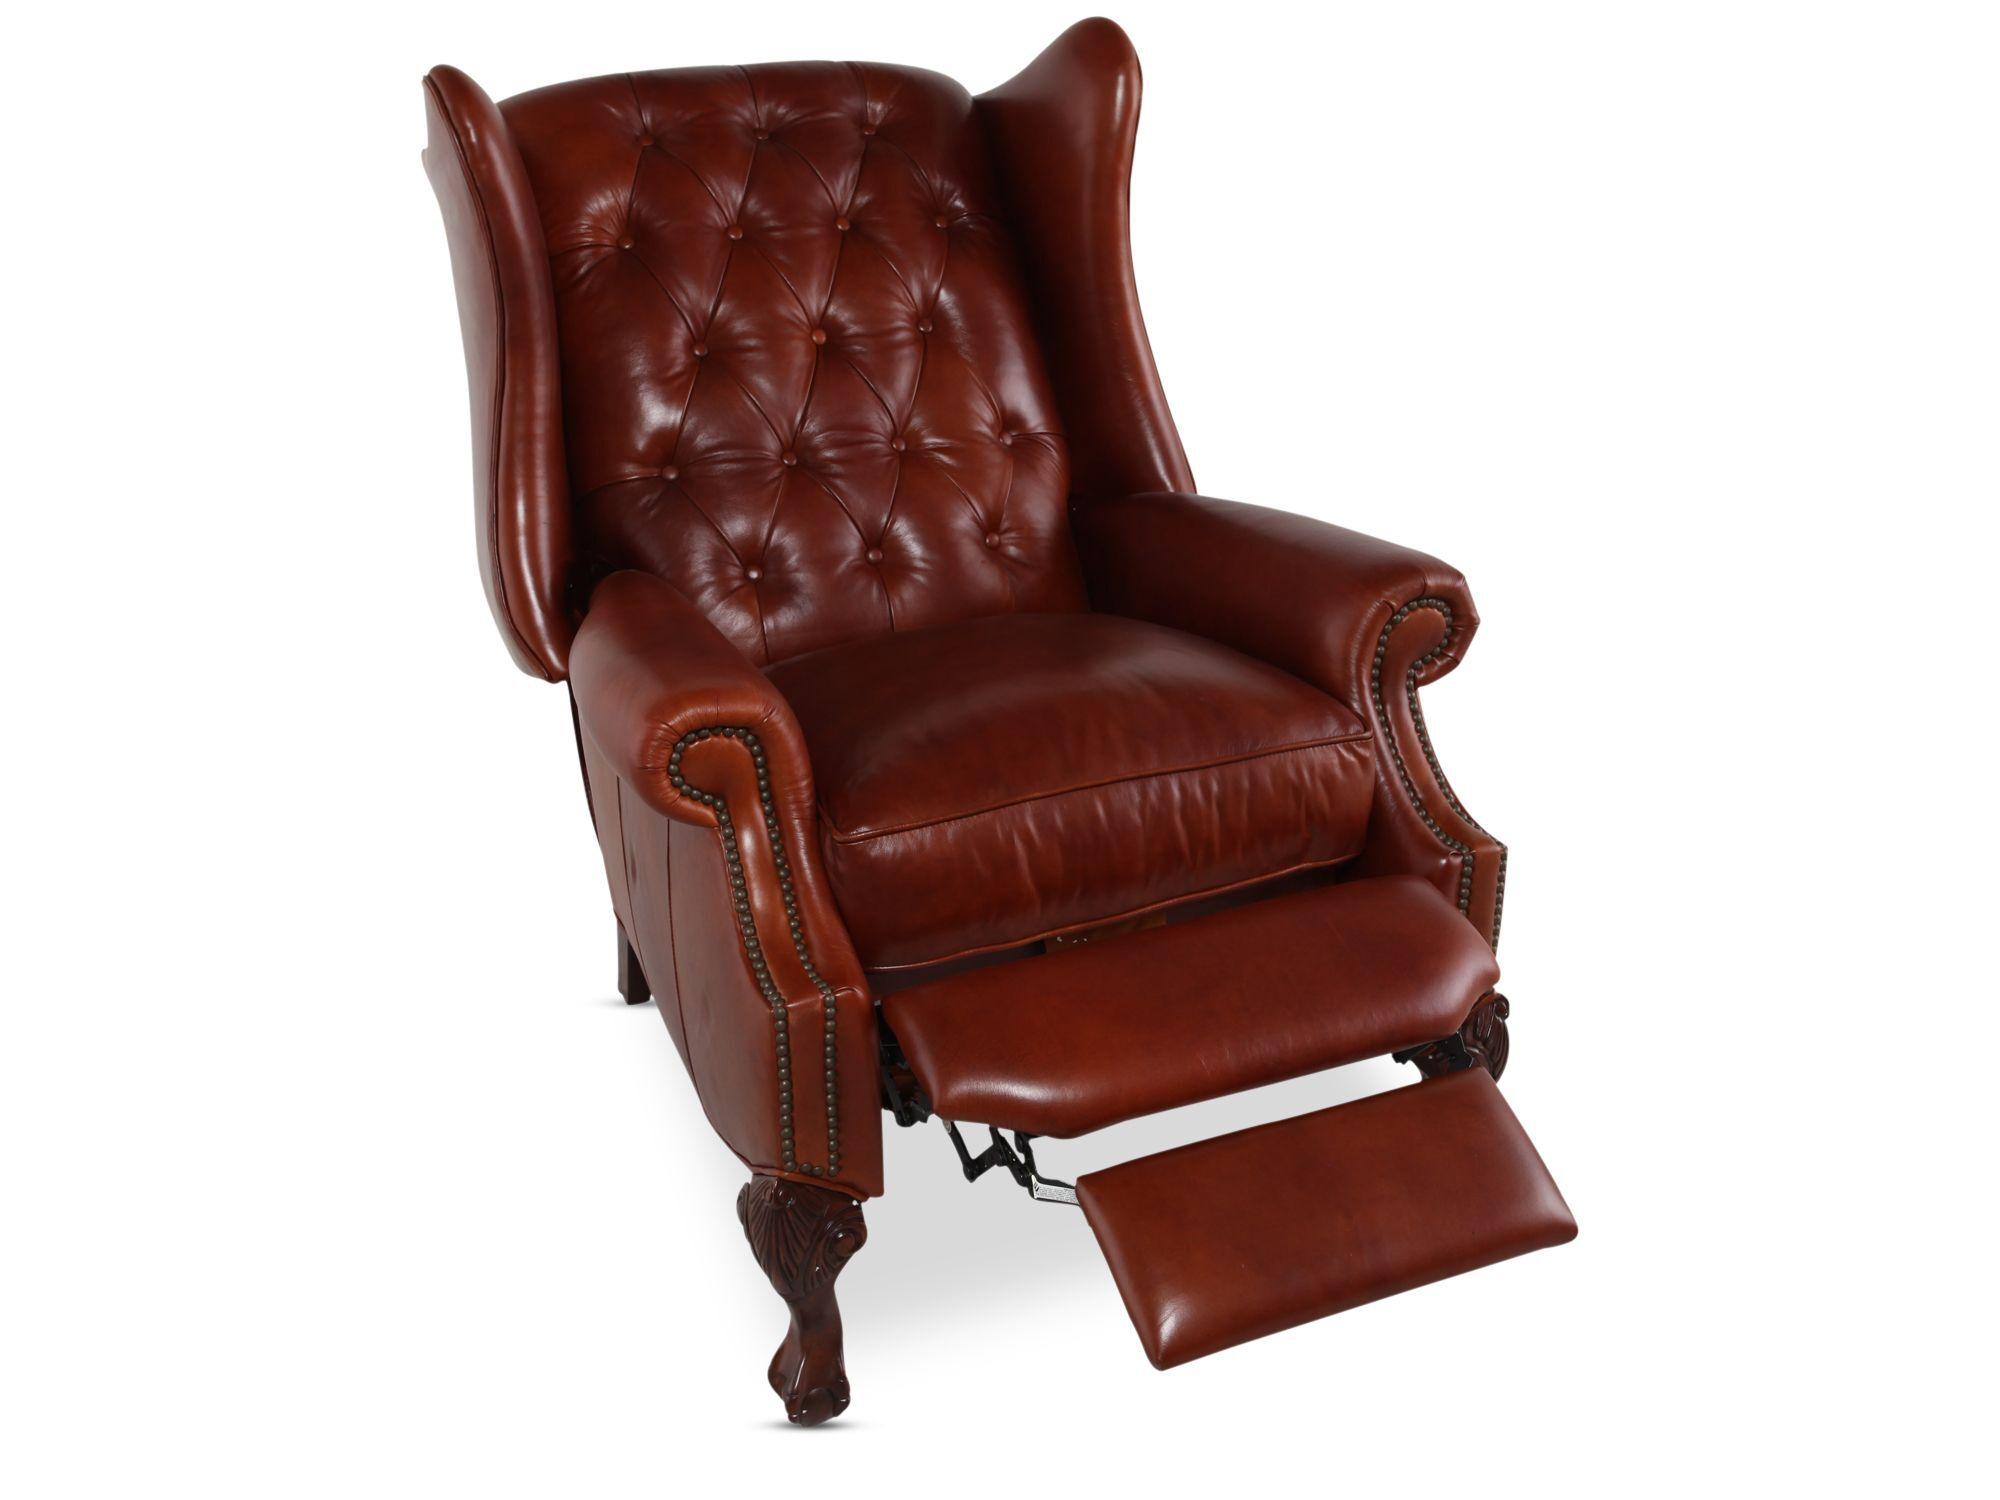 Henredon Leather Recliner  sc 1 st  Mathis Brothers & Henredon Leather Recliner | Mathis Brothers Furniture islam-shia.org